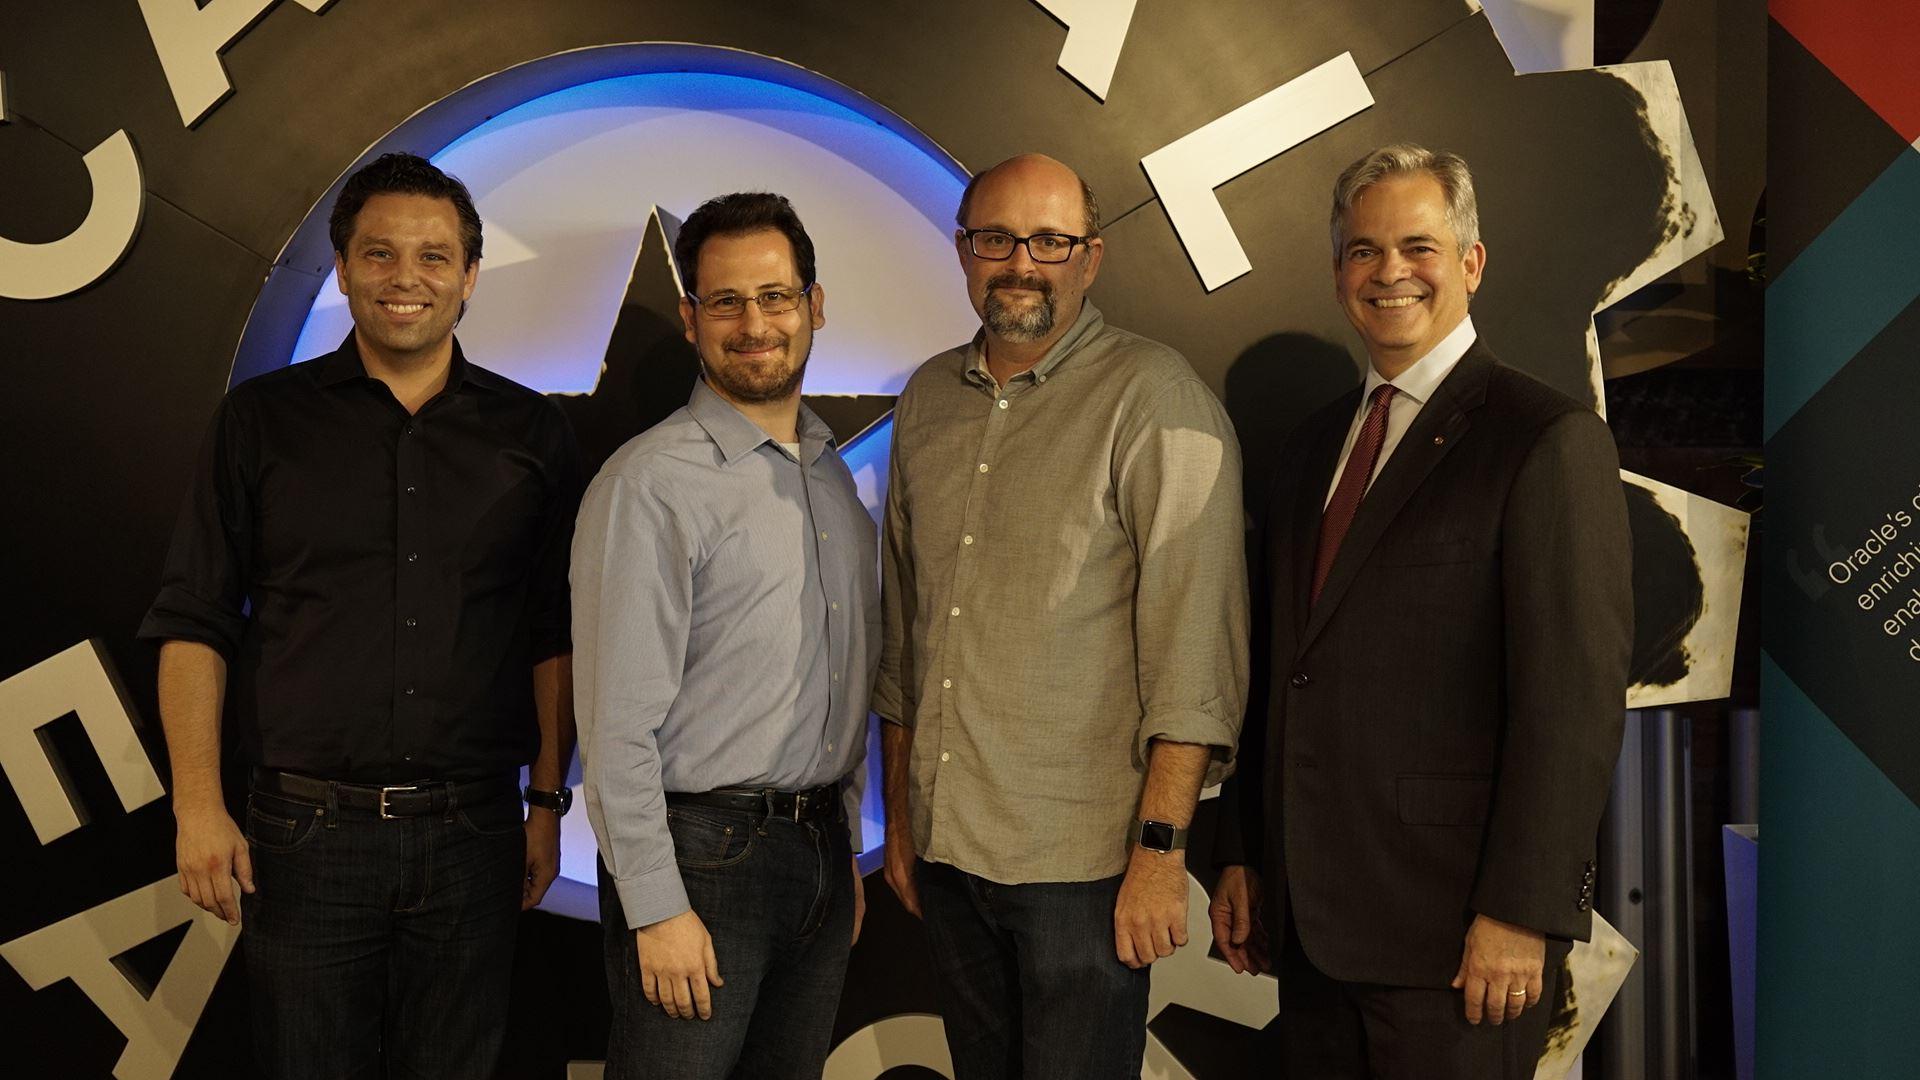 ResilientGrid's leadership team with Austin Mayor Steve Adler